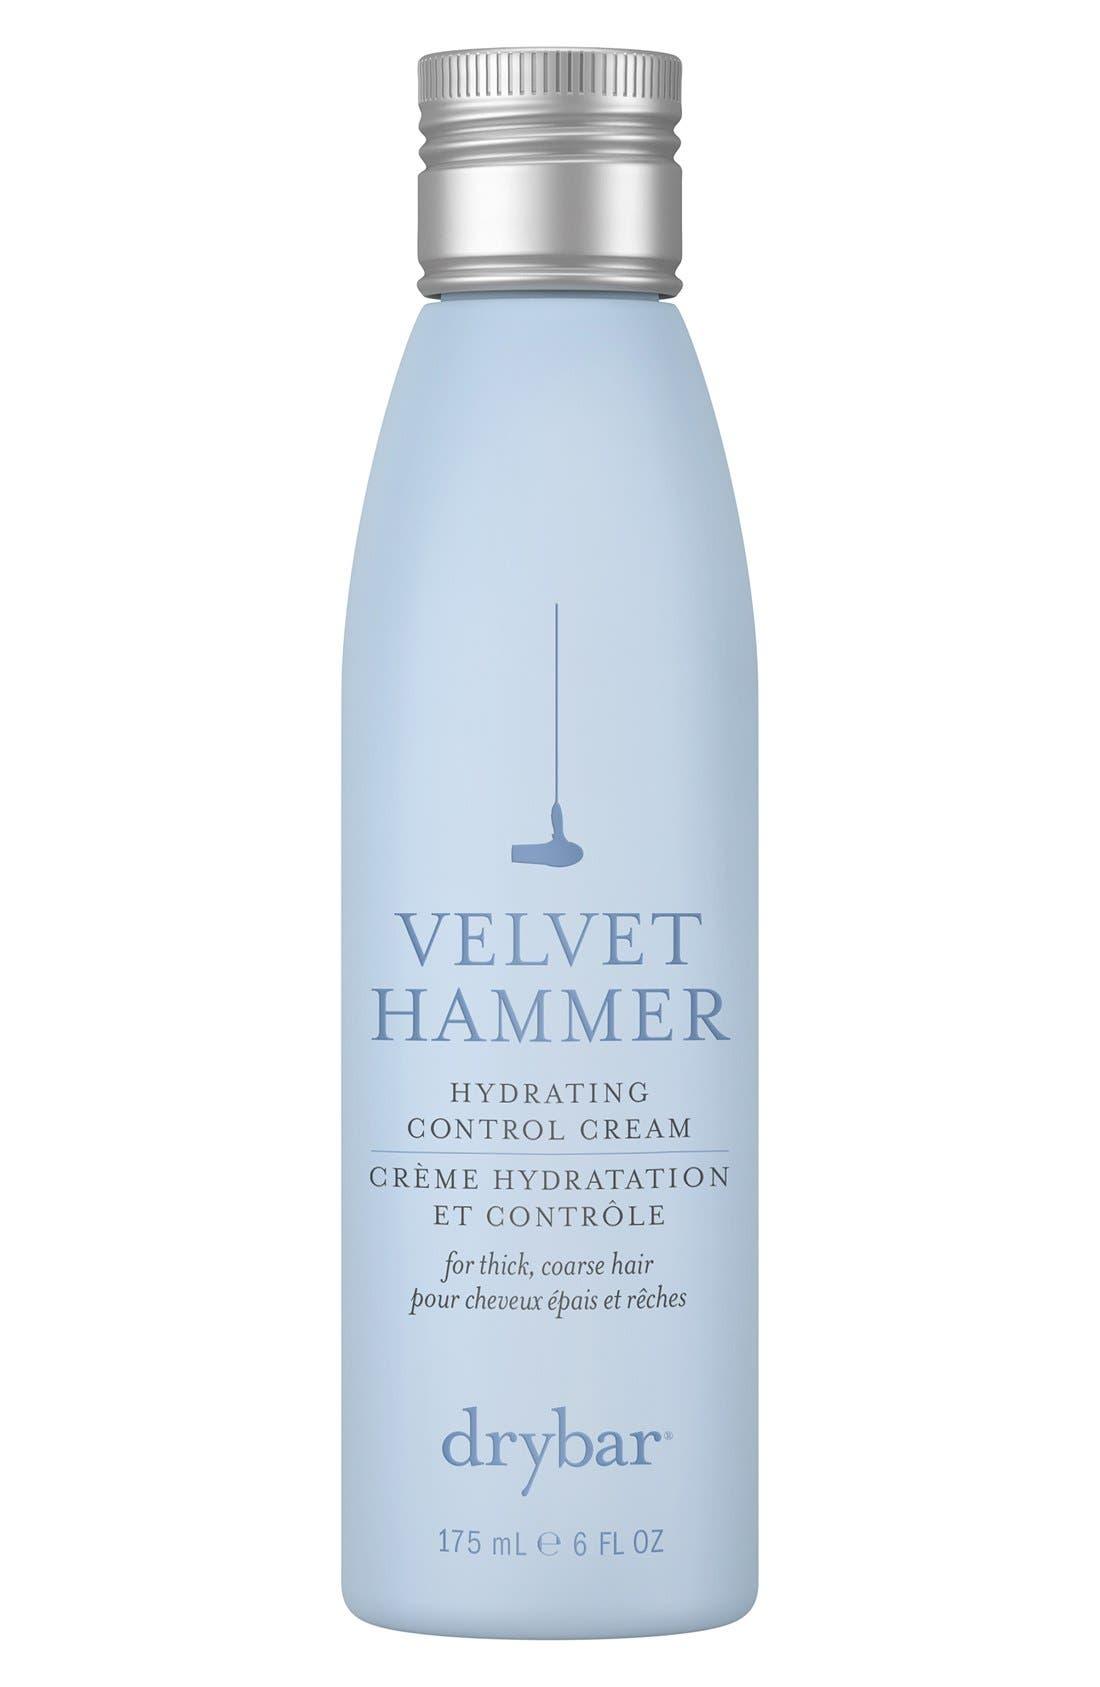 Drybar 'Velvet Hammer' Hydrating Control Cream